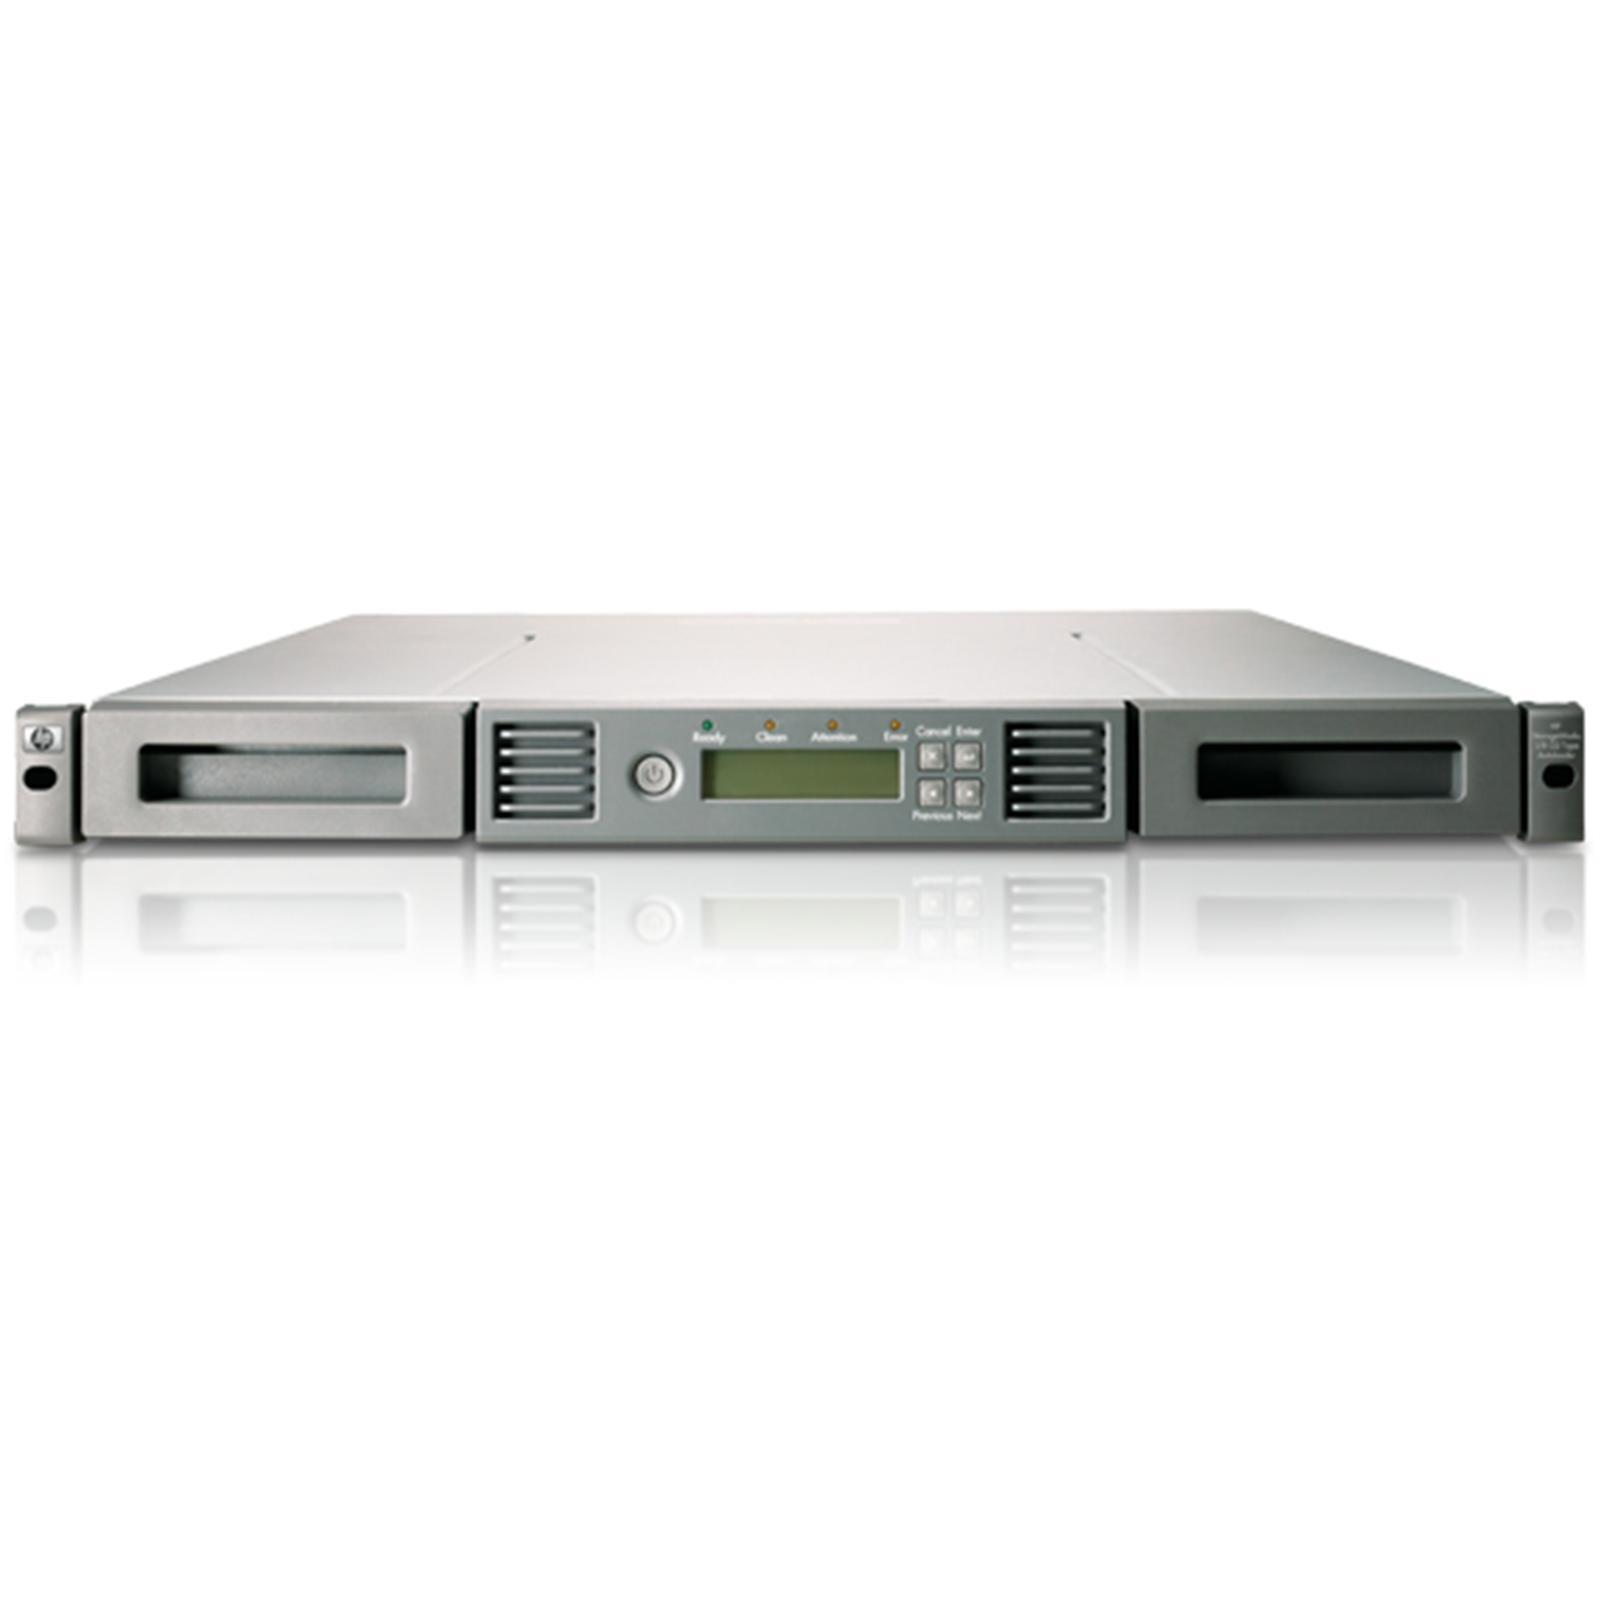 HP 1/8 G2 LTO-5 3000 SAS Autoloader